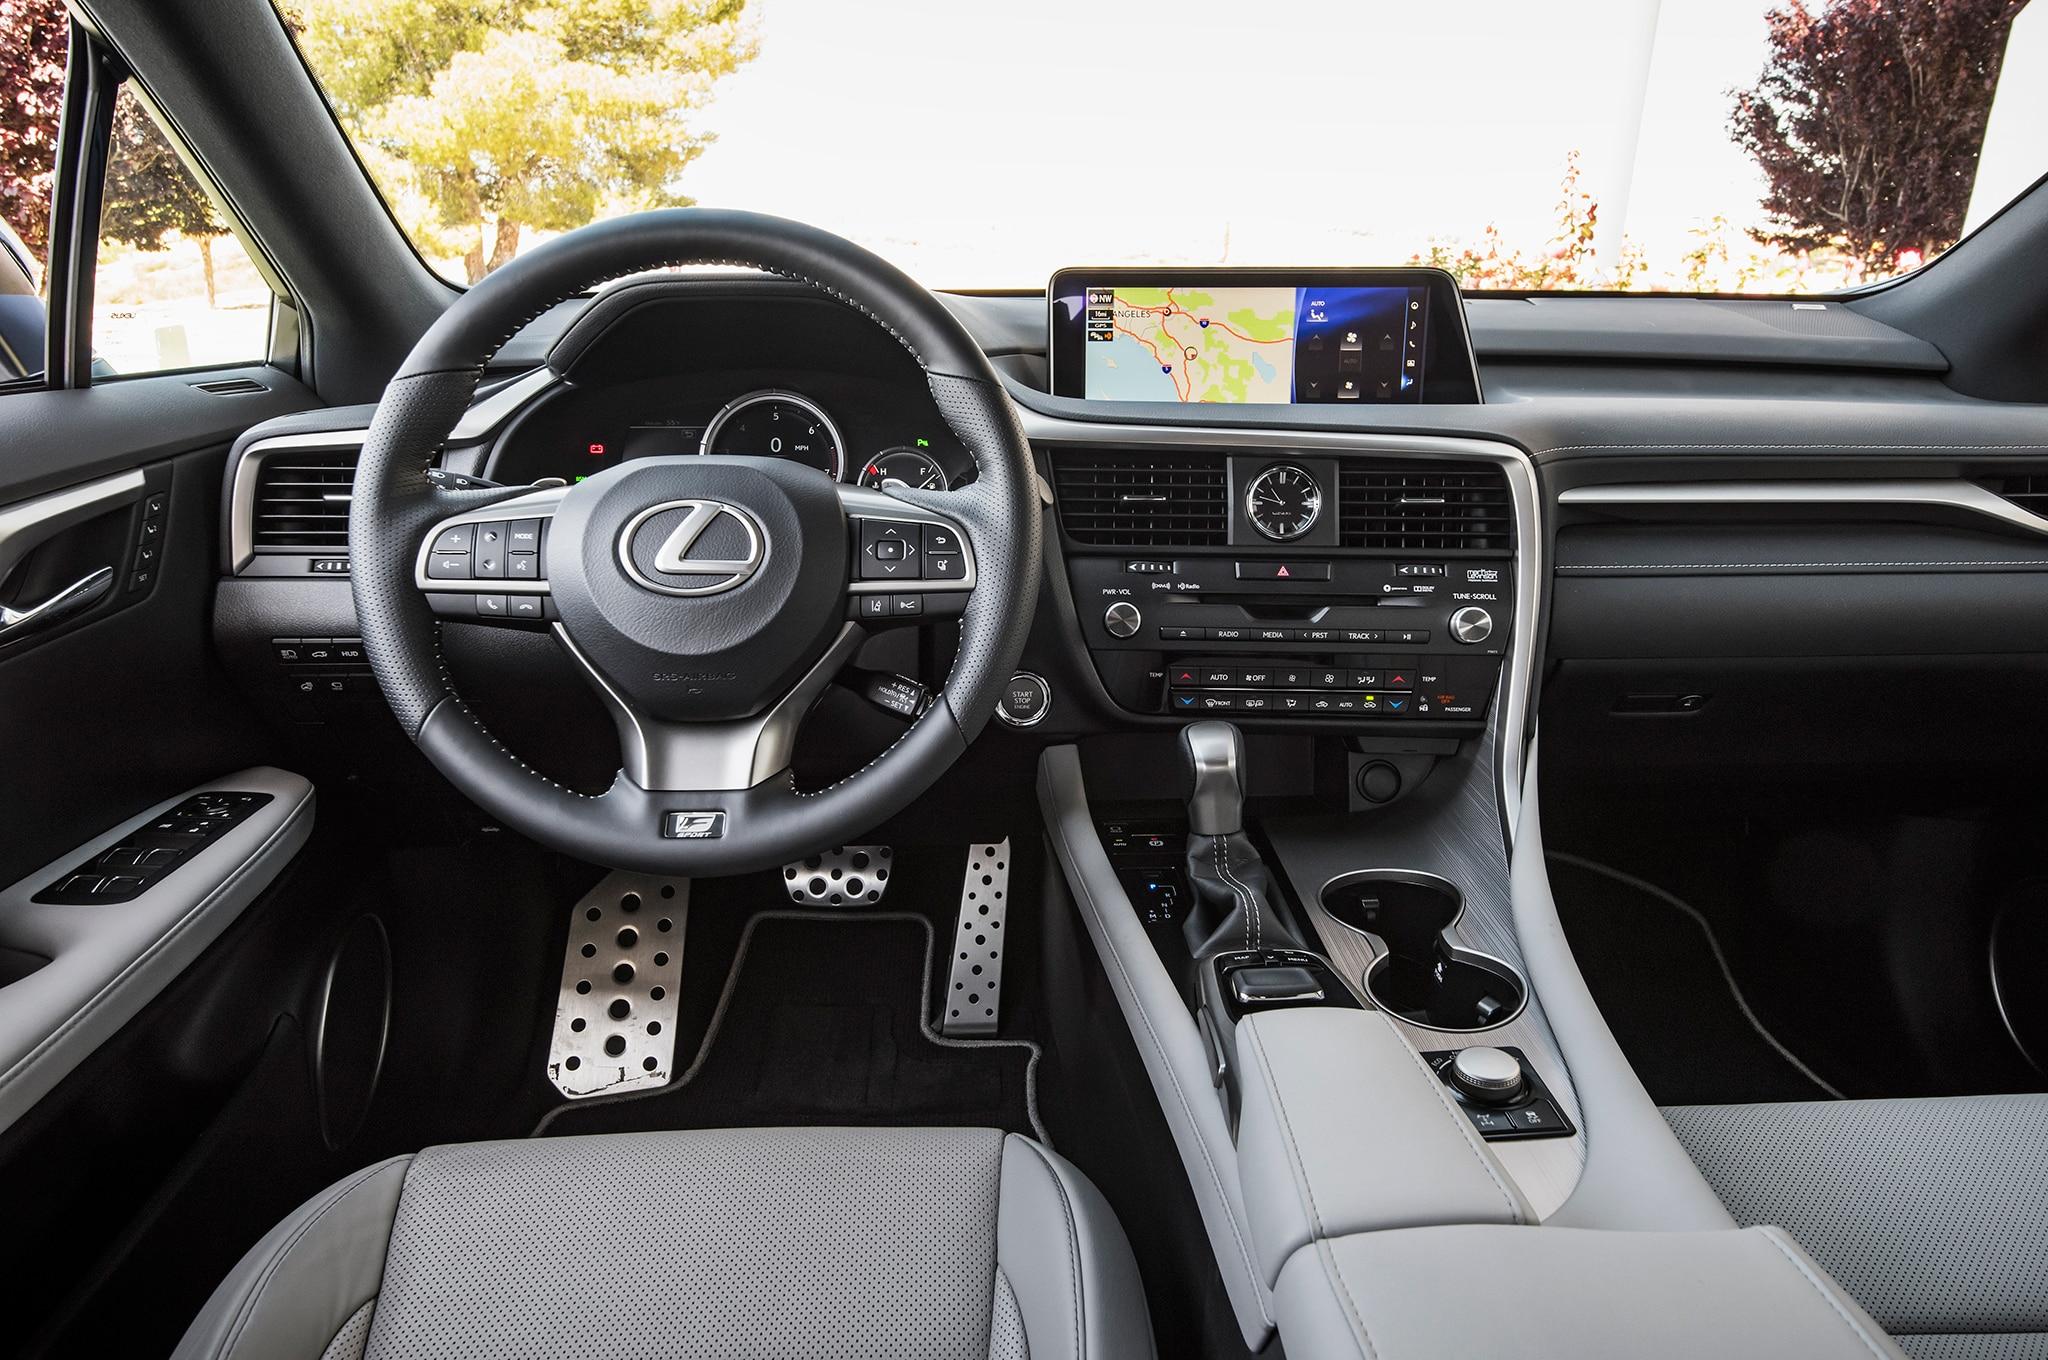 2016 lexus rx 350 f sport interior view motor trend en espa ol. Black Bedroom Furniture Sets. Home Design Ideas